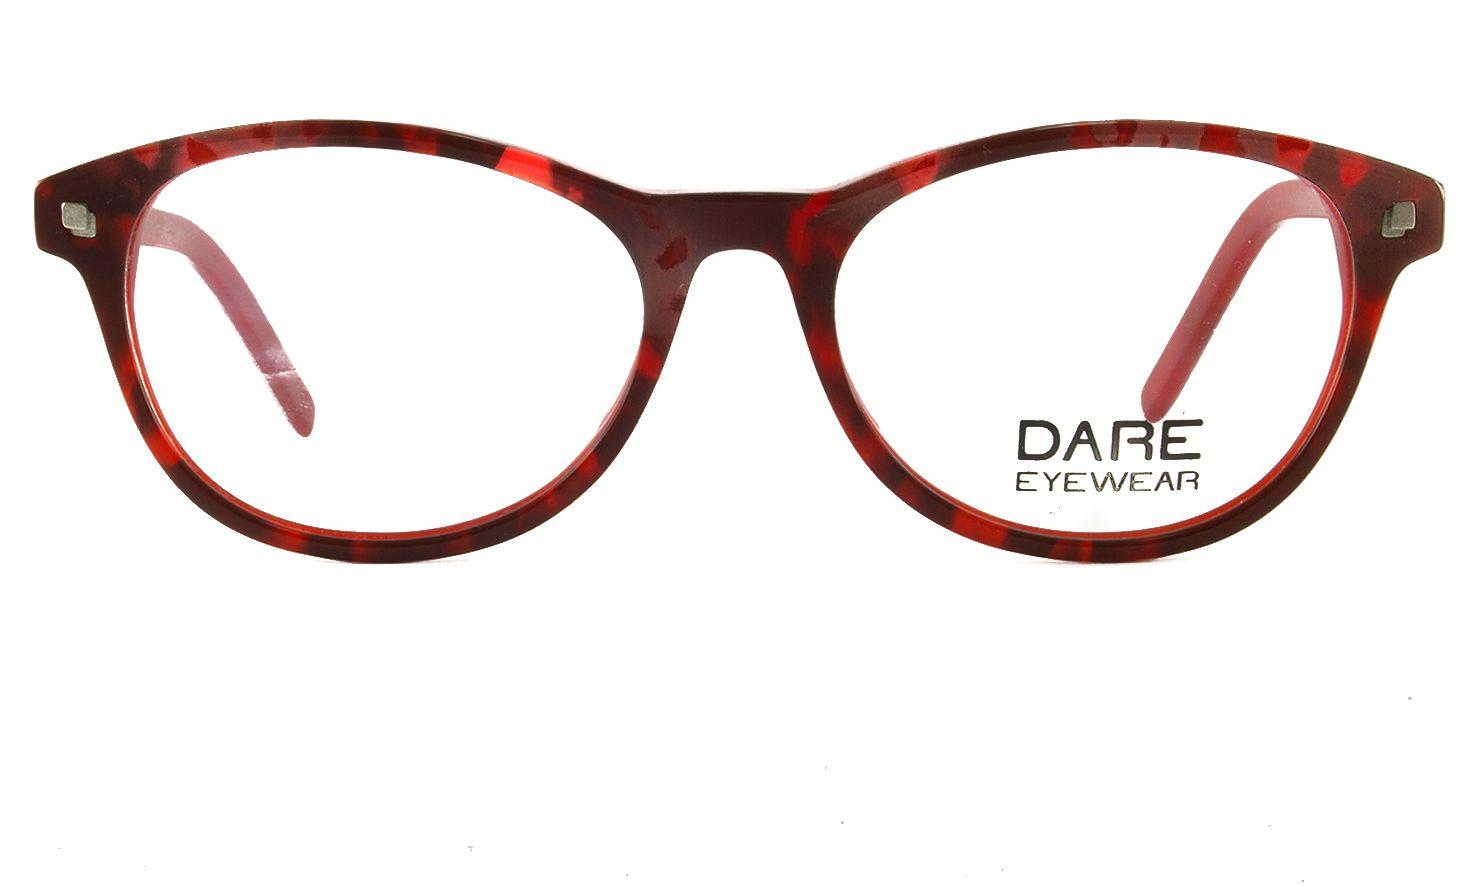 aeafab1d7425 Cruz - Dare Eyewear frames from Tesco Opticians